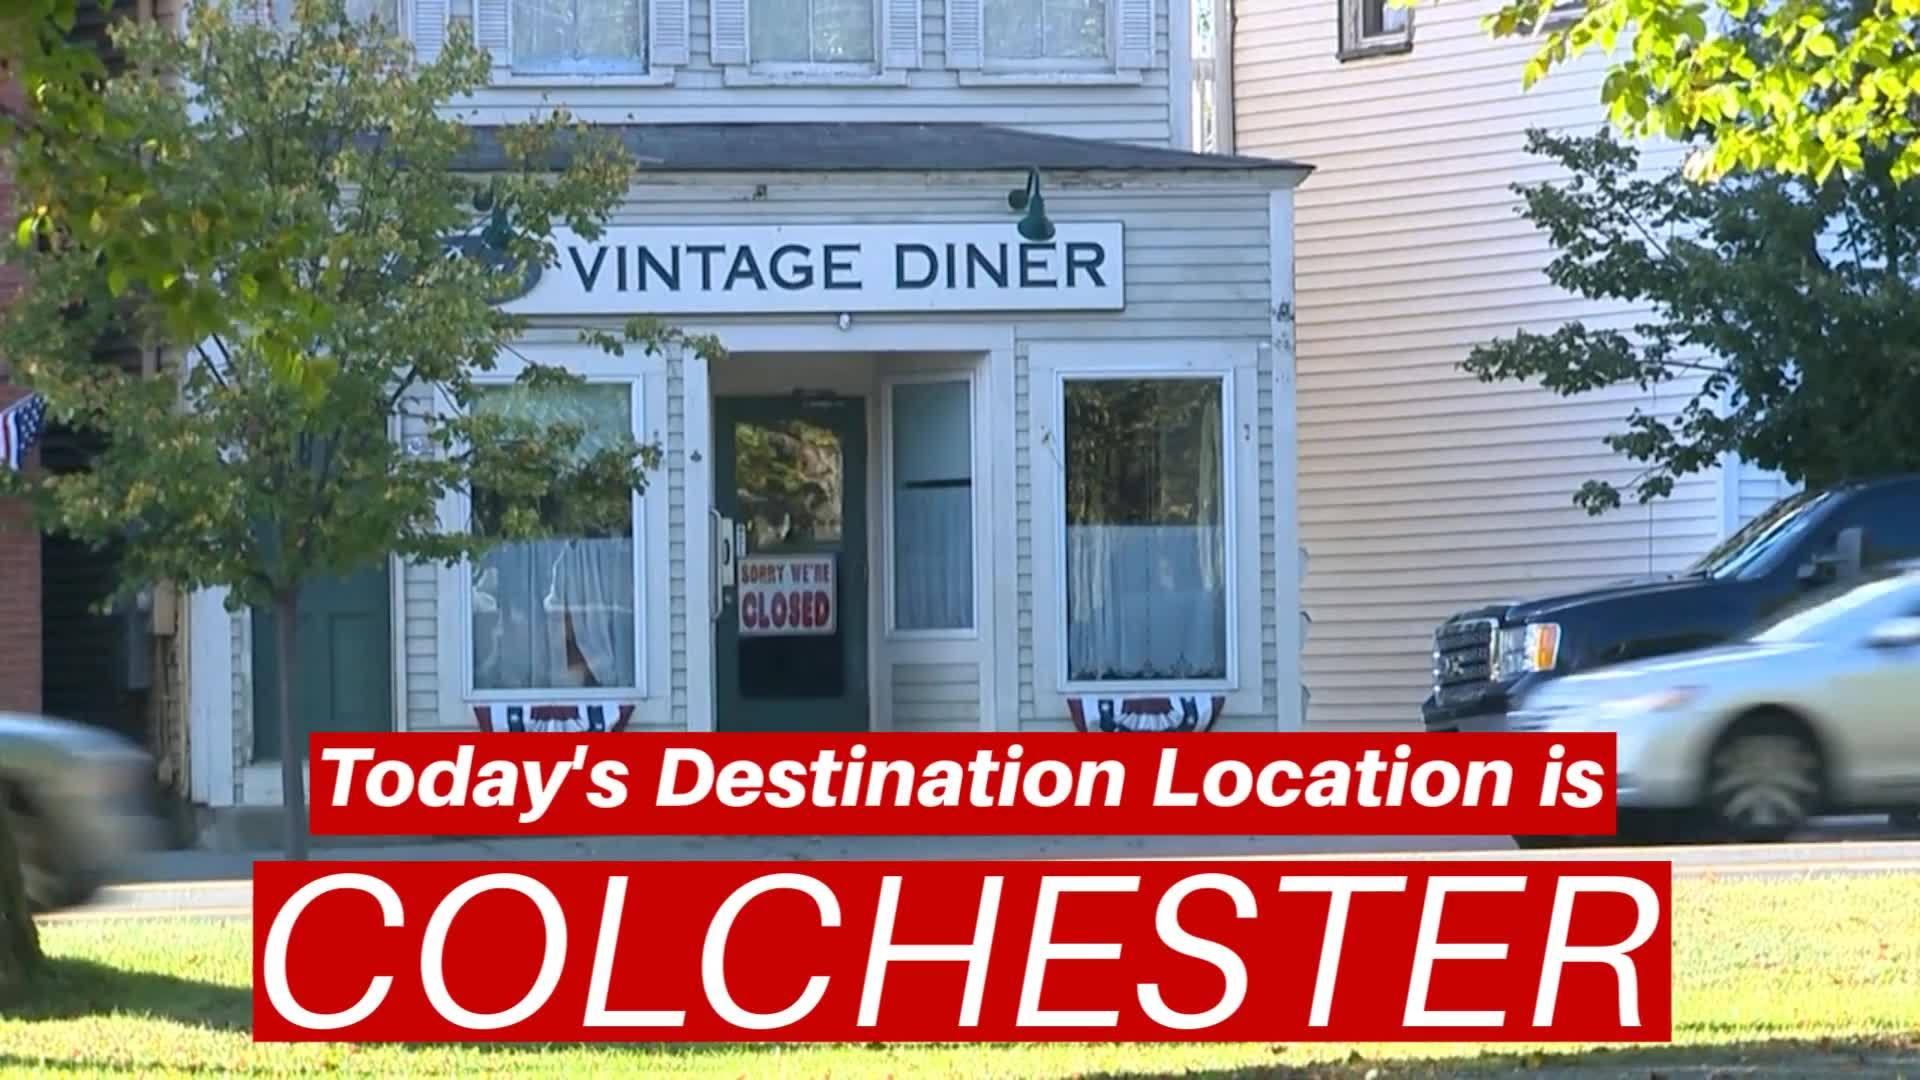 Destination_Location__News_8_Visits_Colc_2_20181203111359